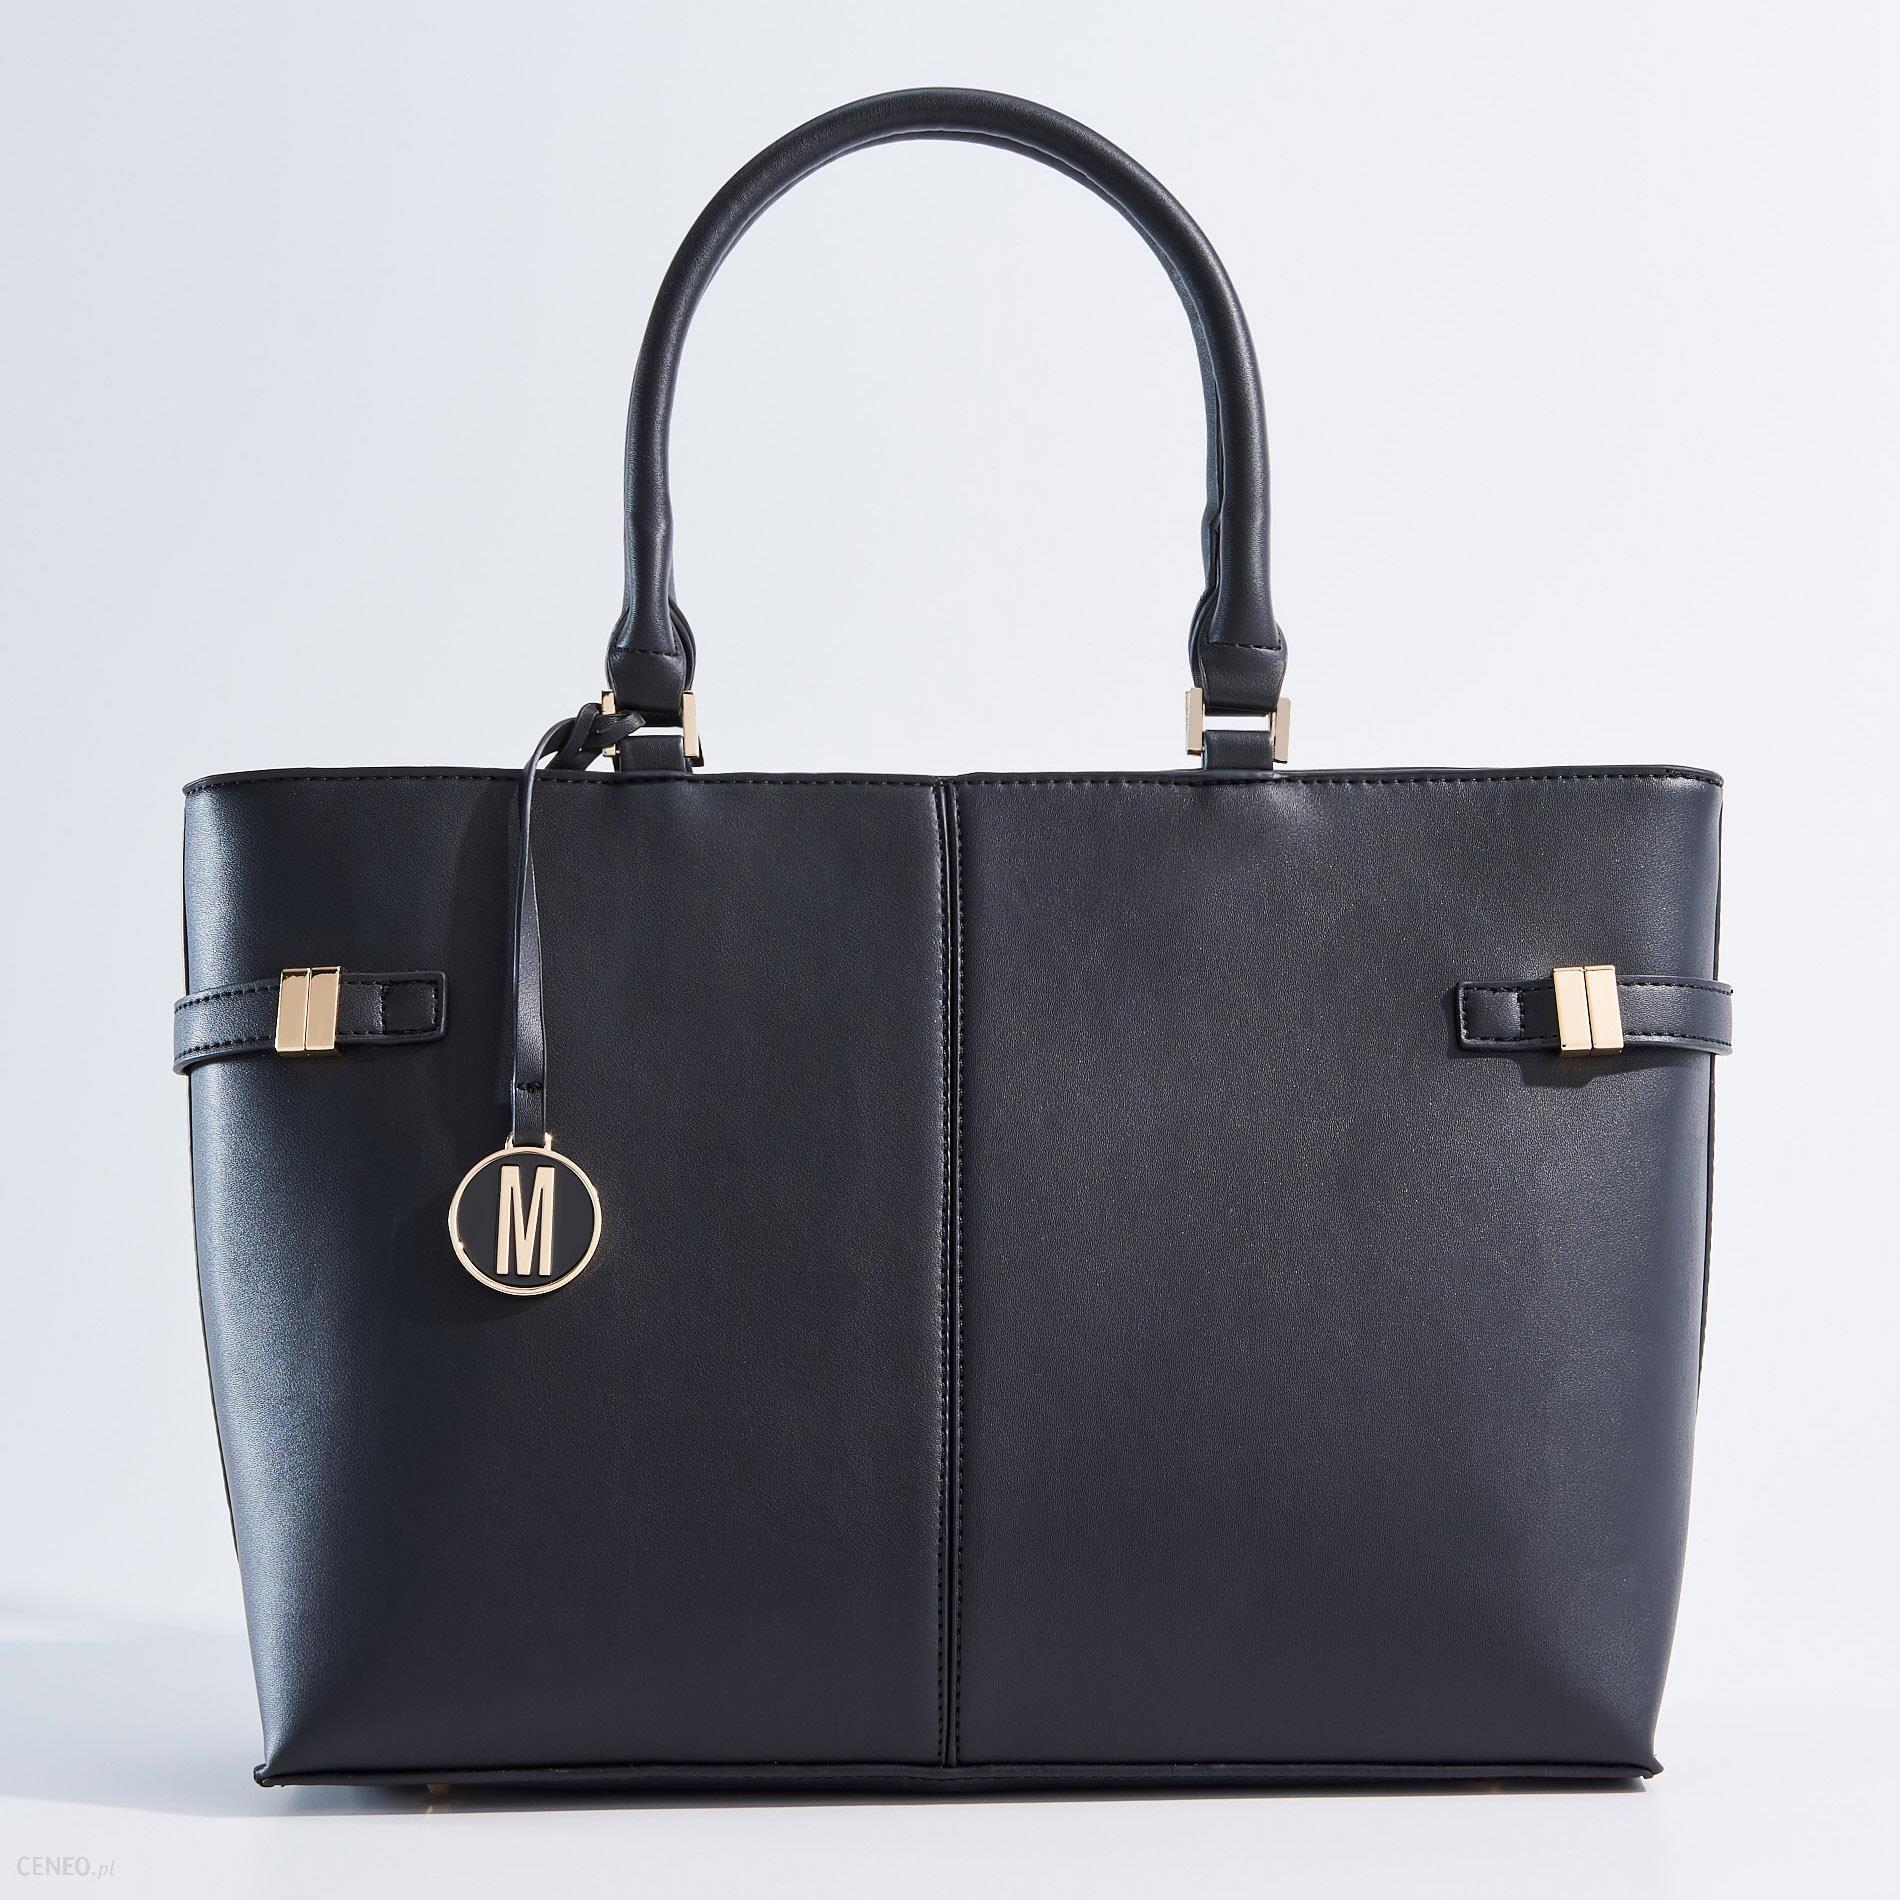 b590682c9bda7 Mohito - Elegancka torebka typu city bag - Czarny - Ceny i opinie ...